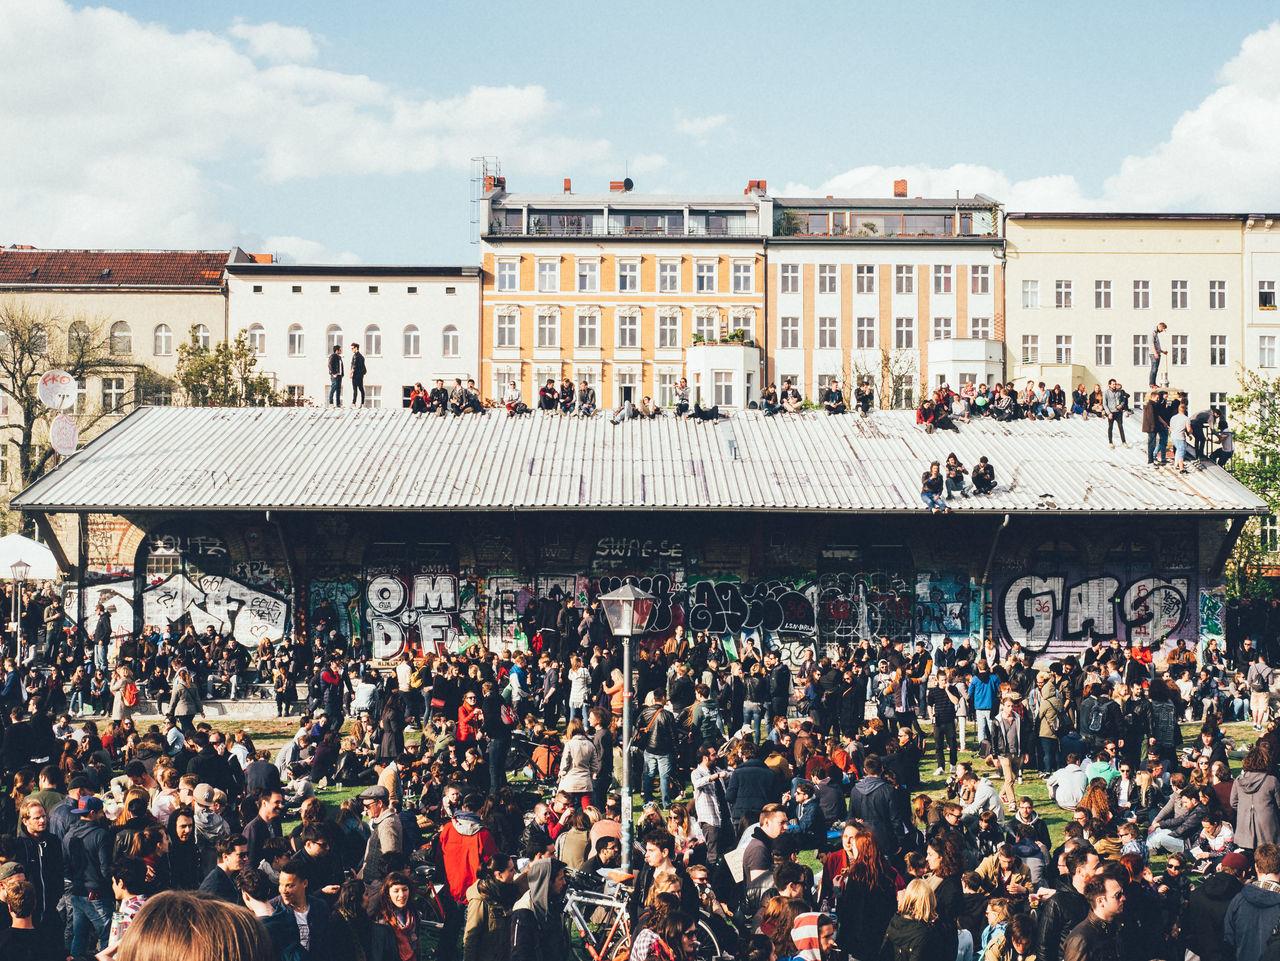 Crowd in görlitzer park during may day 2015 in berlin